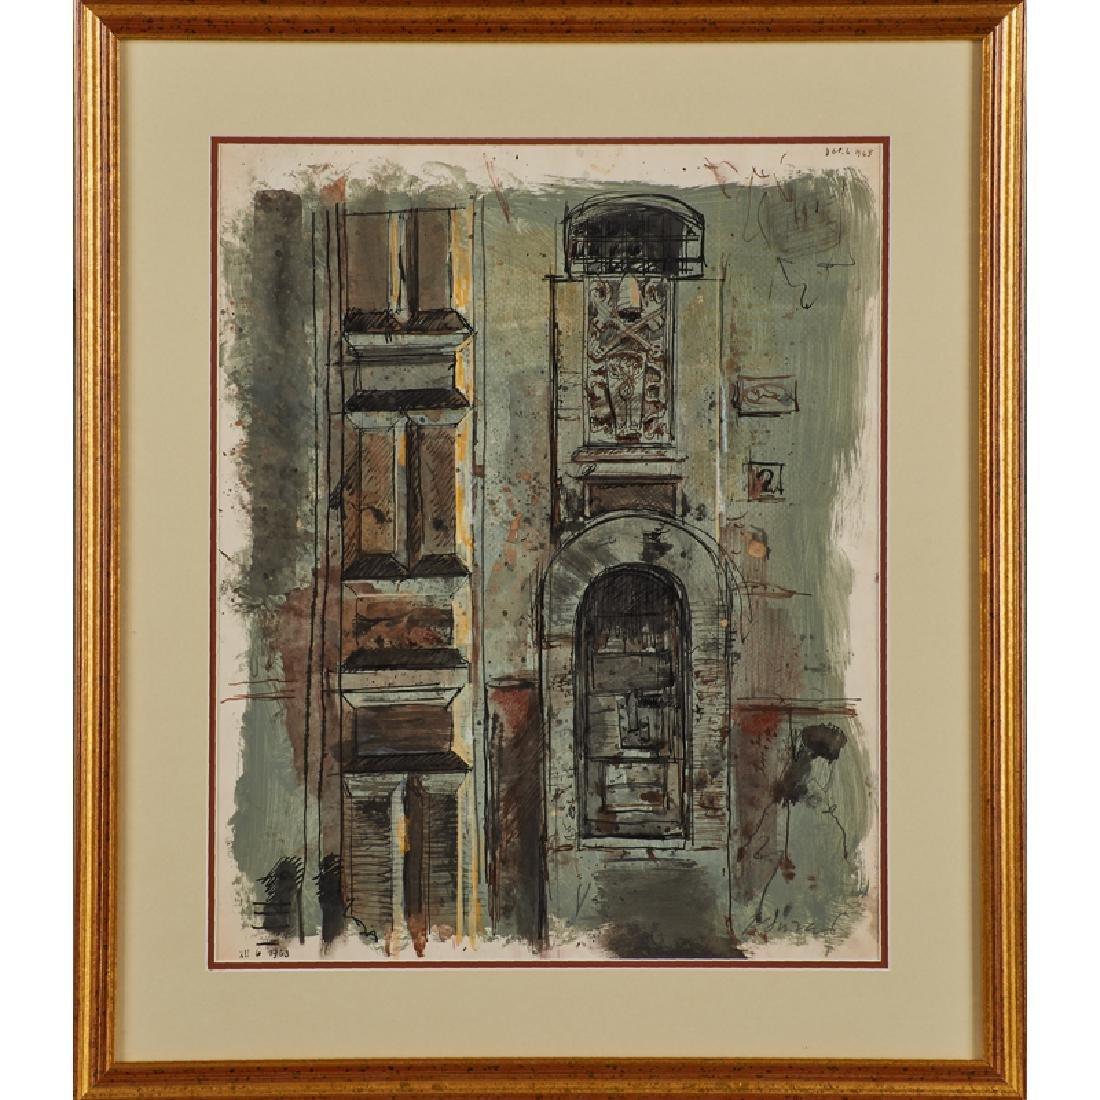 ADOLF KONRAD (American, 1915-2003)